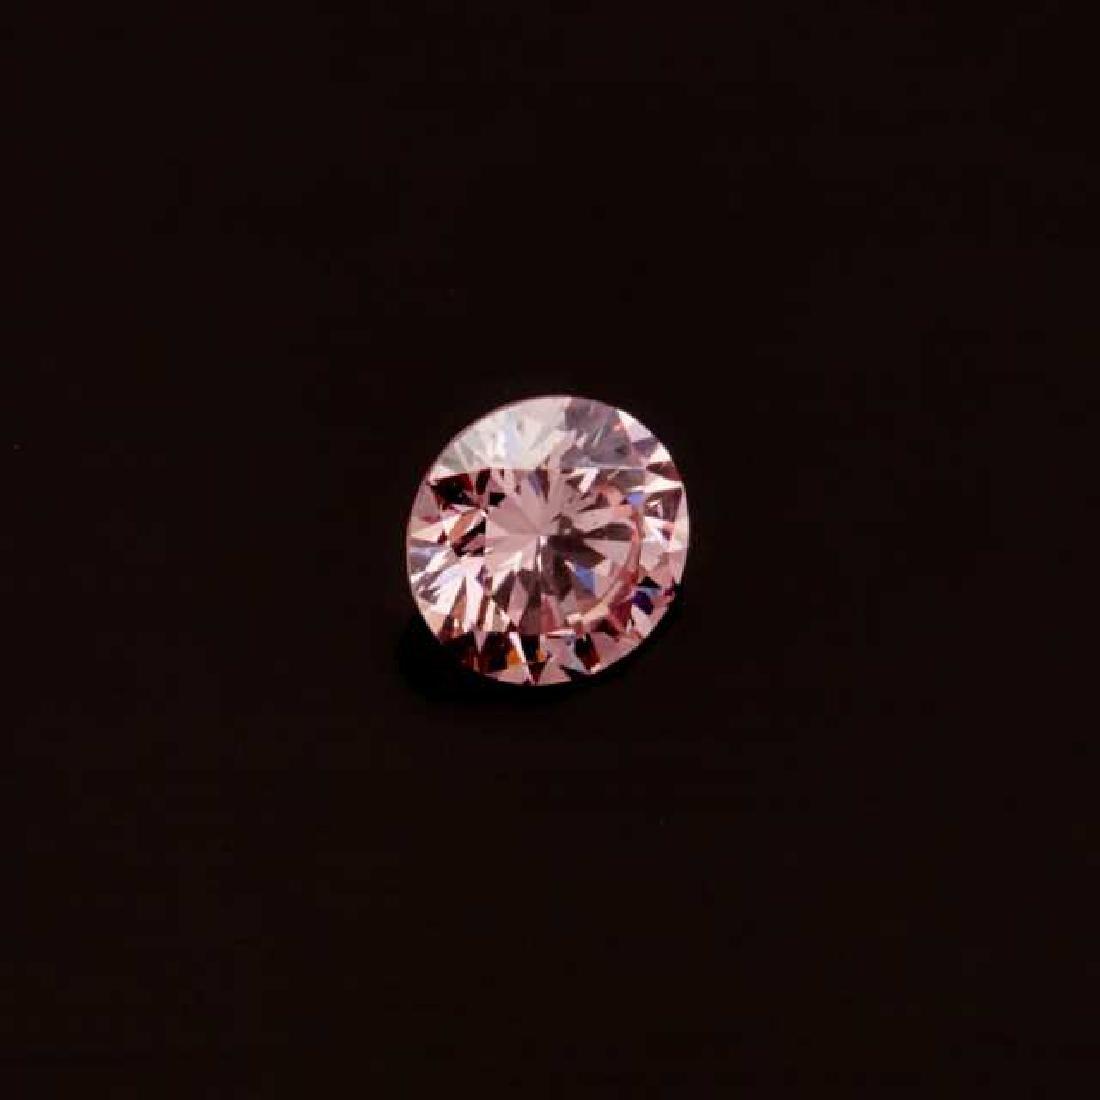 Unmounted Purplish-Pink Brilliant Cut Diamond